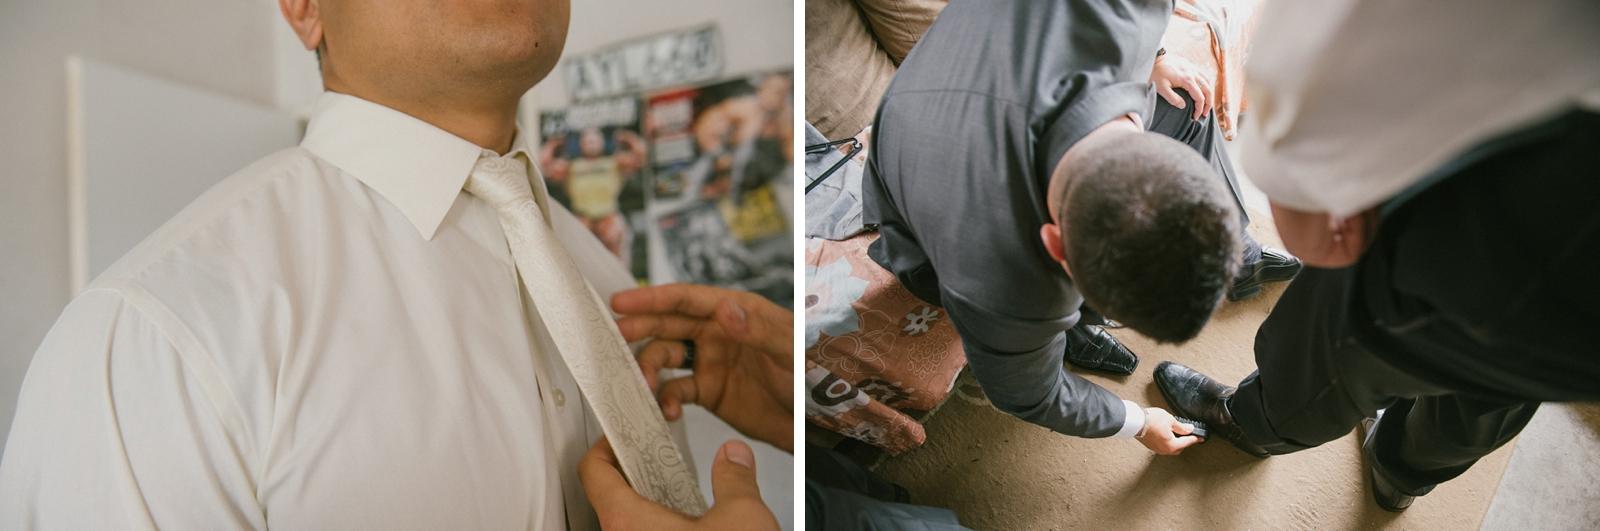 GabbyFiti_Auckland Wedding Photographer_Patty Lagera_0020.jpg